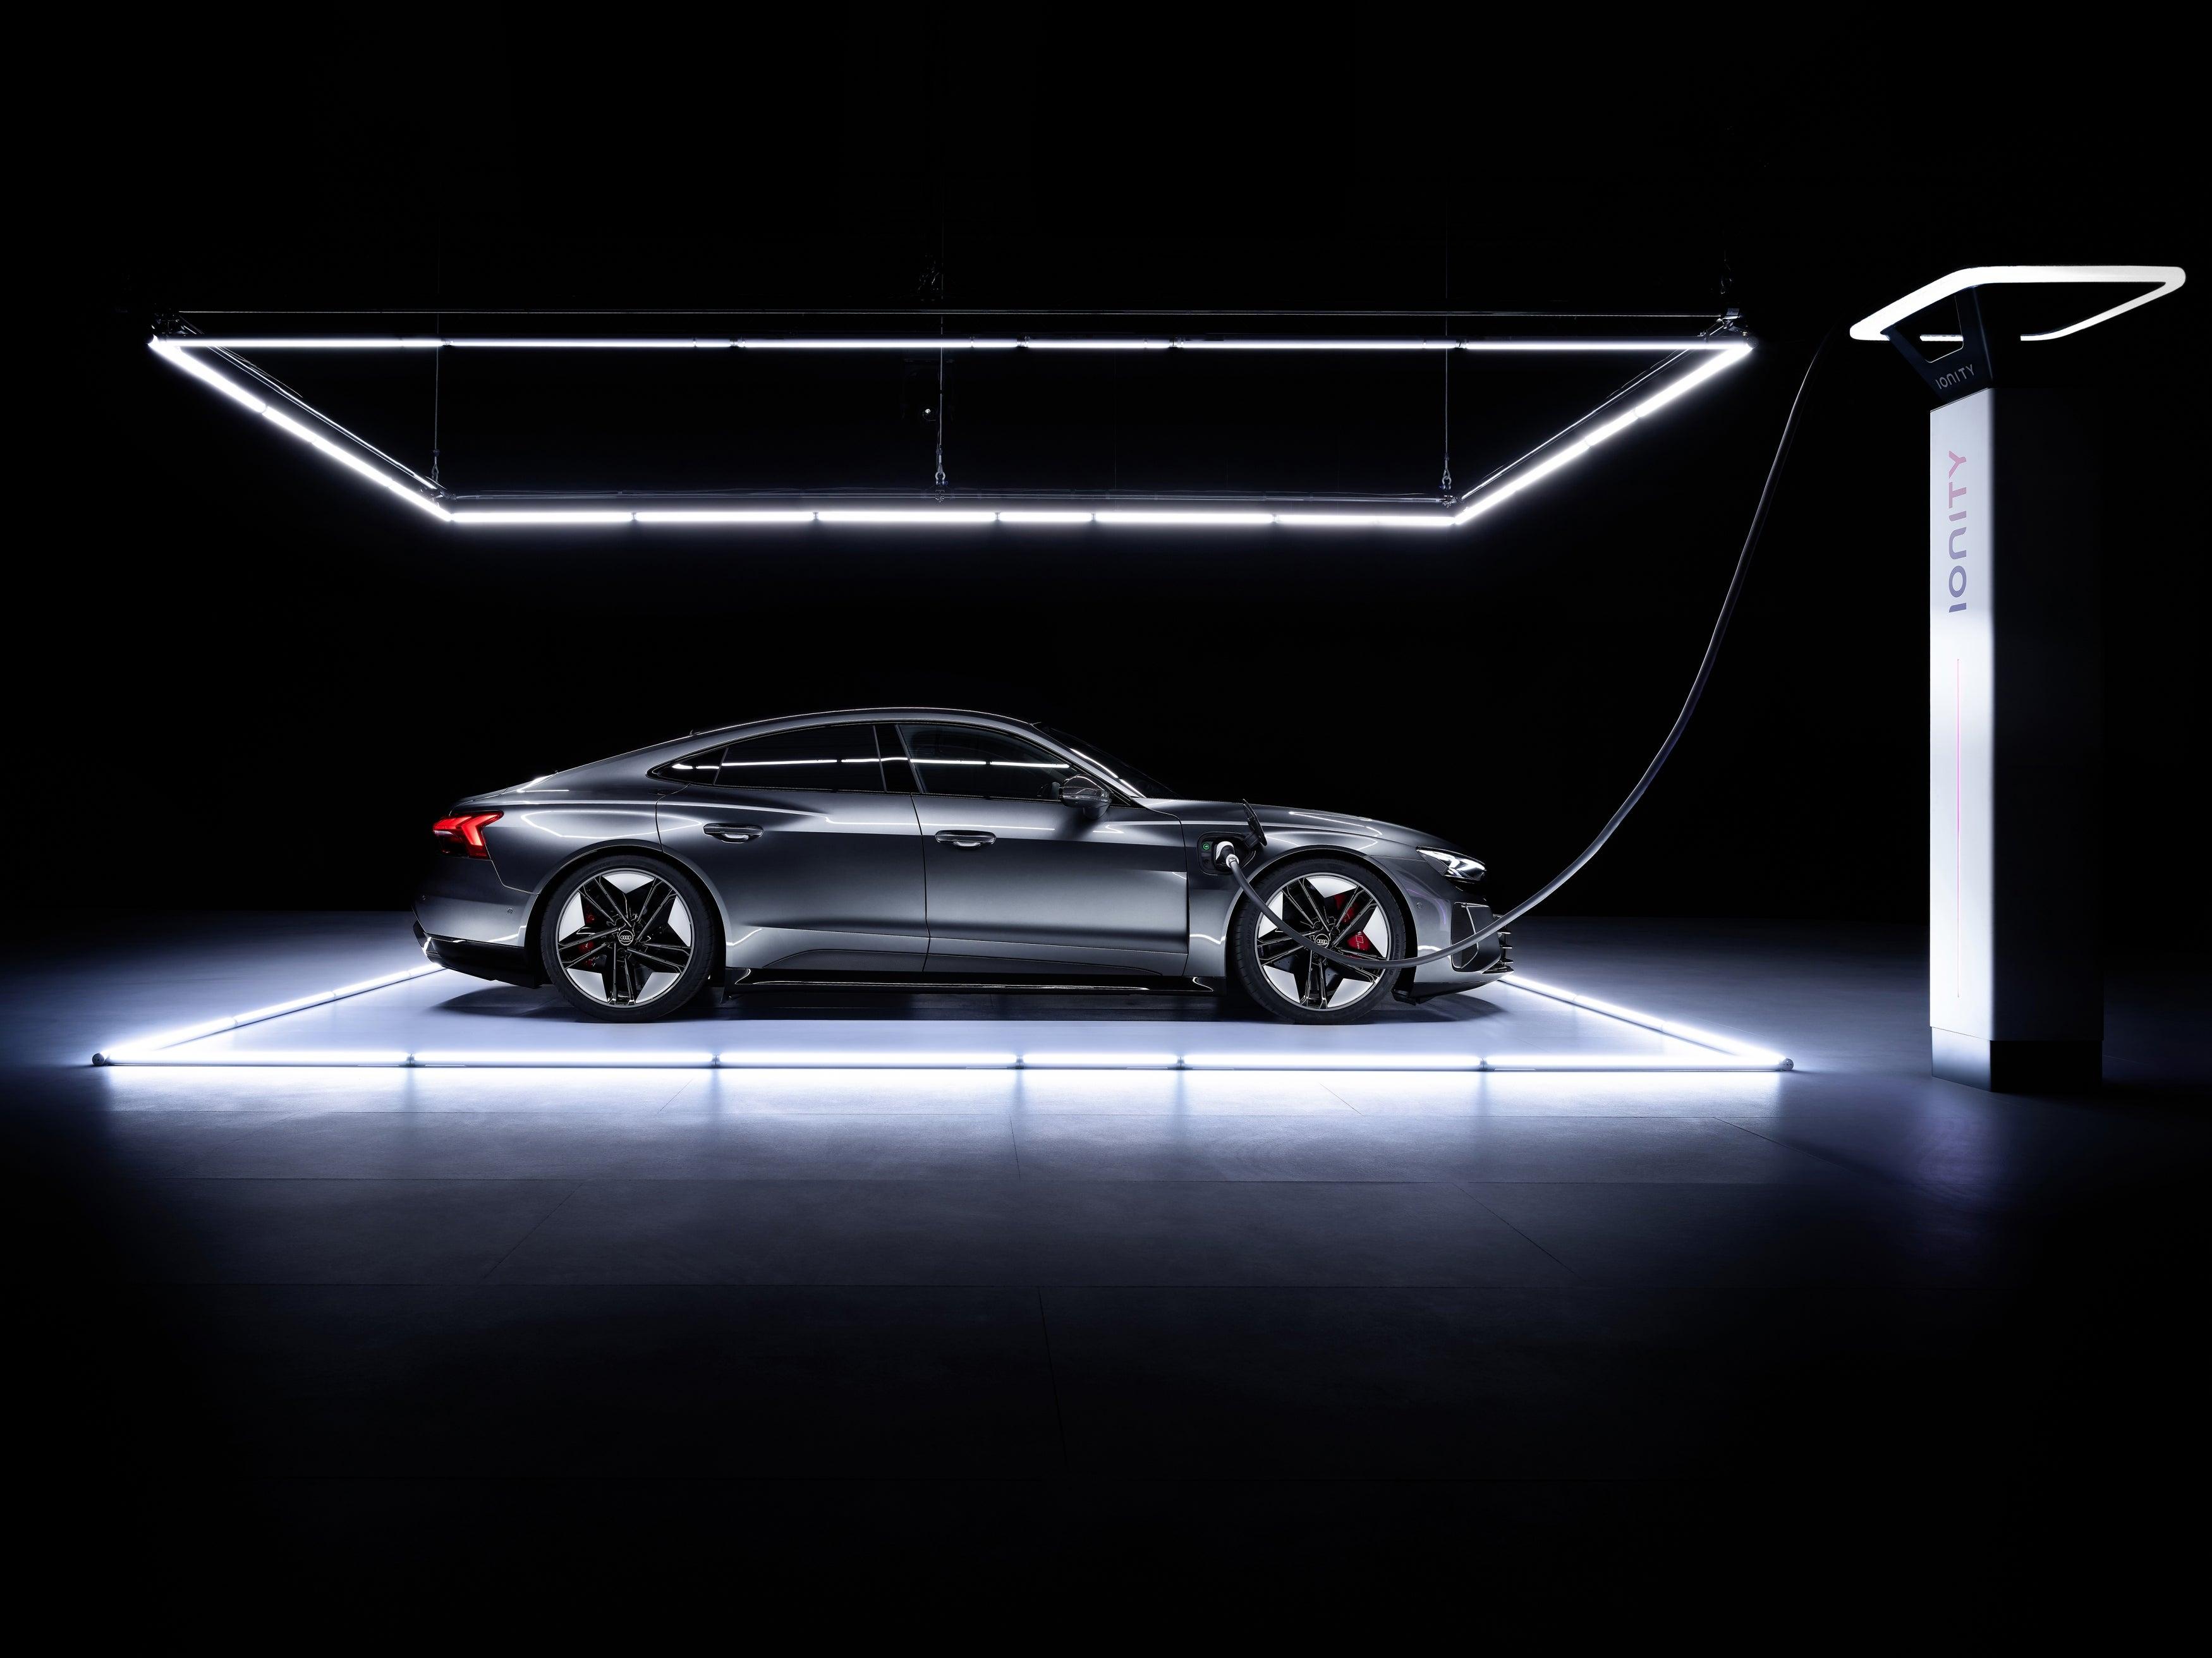 The 2022 Audi e-tron GT.